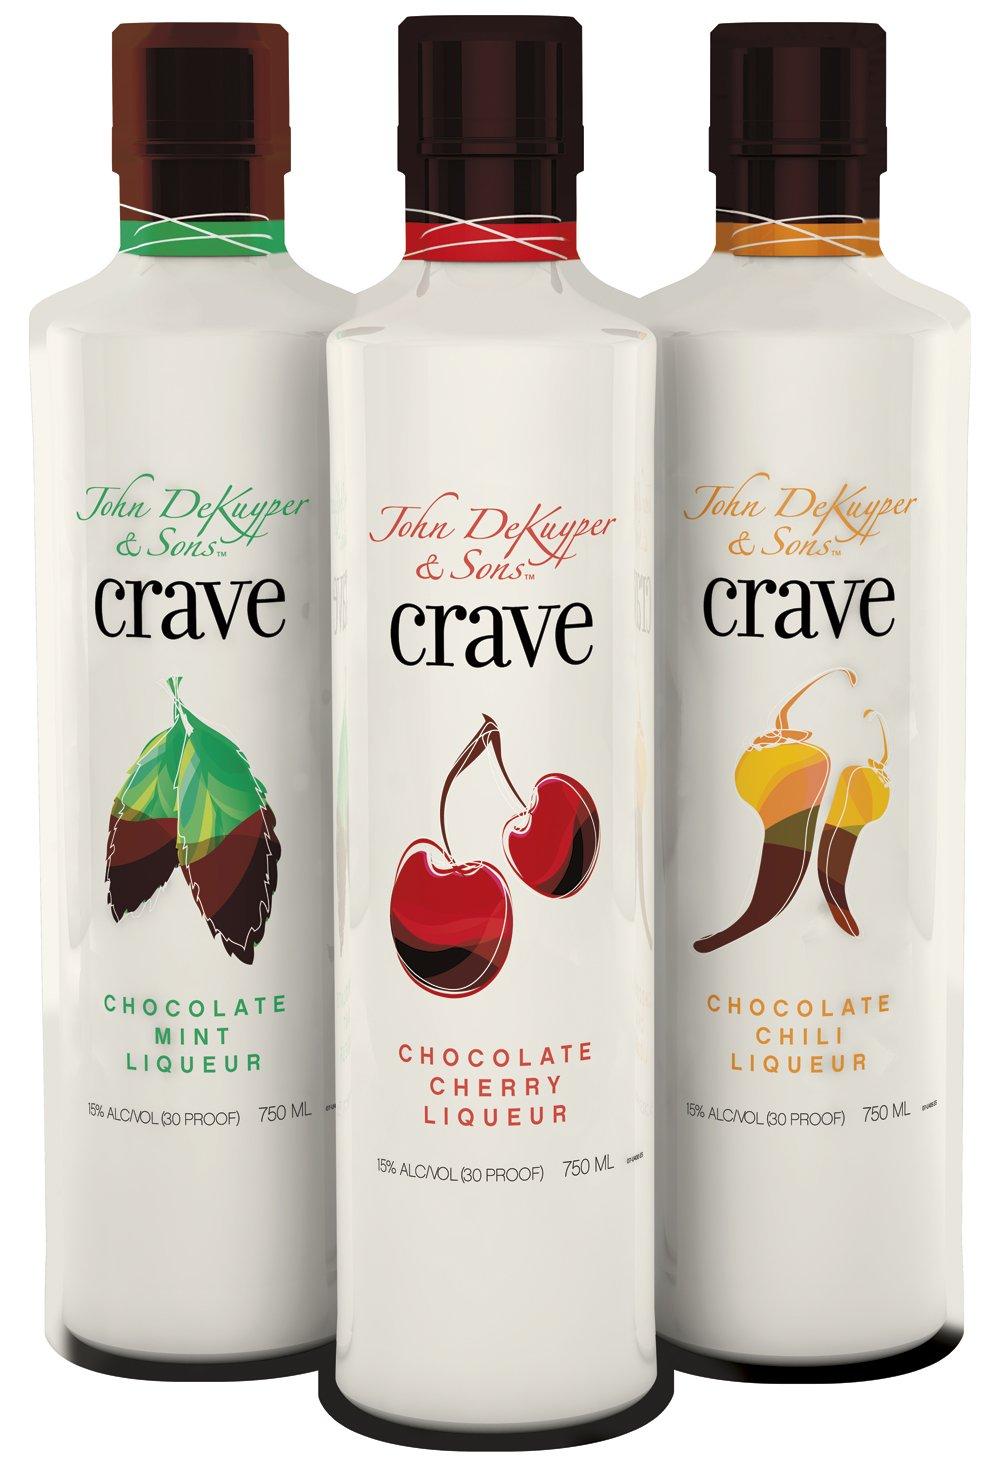 Dekuyper JDK&Sons Crave Chocolate Chili Liqueur